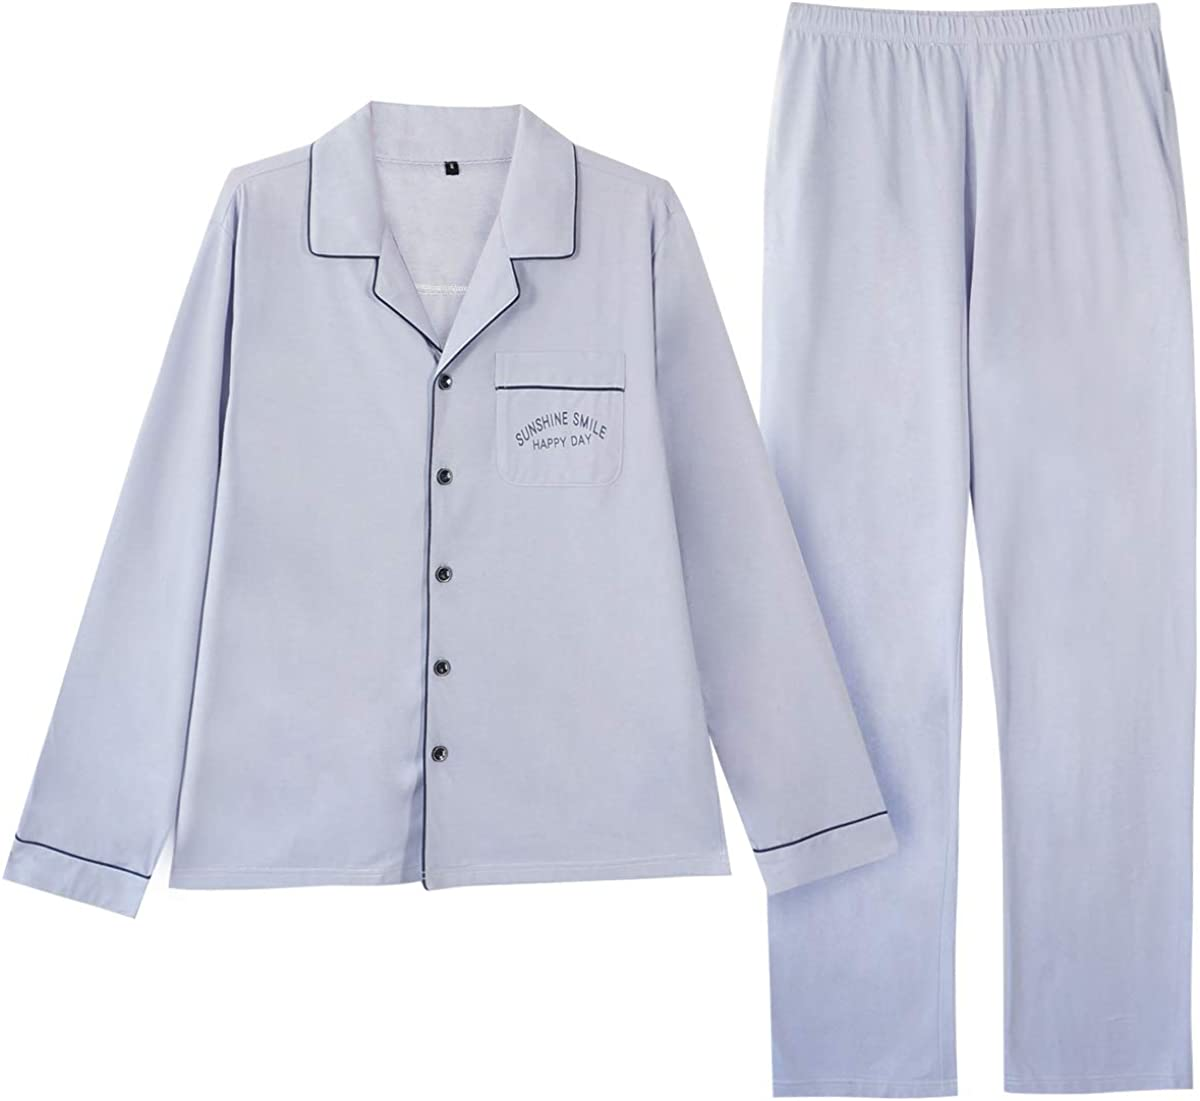 GOSO Mens Pajamas Set Cotton Sleepwear Button-Down Pajamas Set Lightweight Long Sleeve Pjs Set Lounge Sleepwear